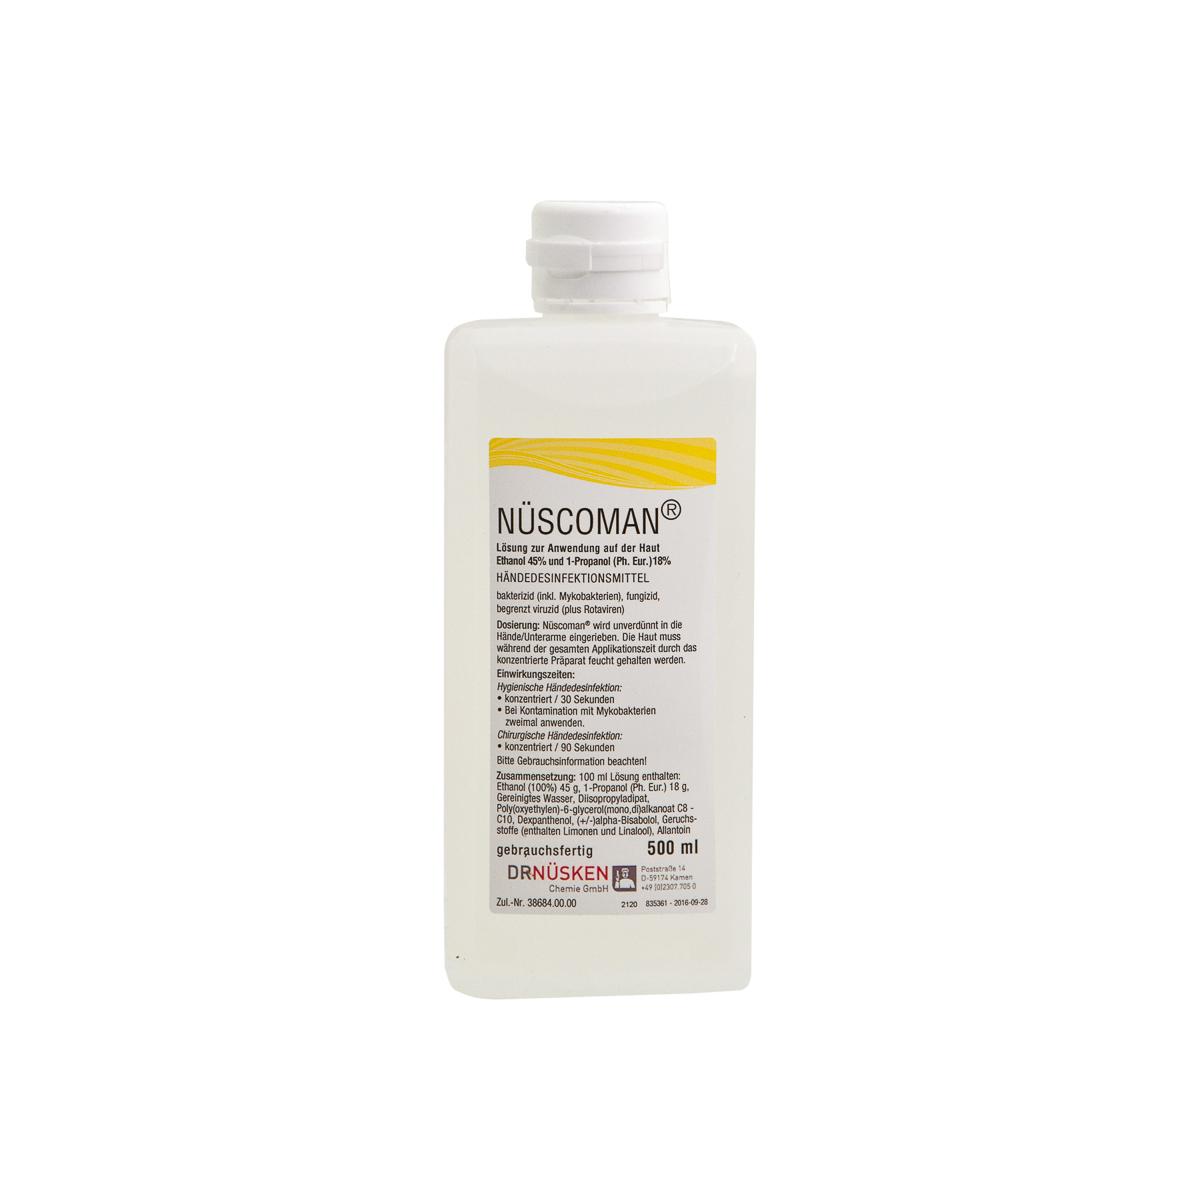 Nüscoman® 500 ml Händedesinfektionsmittel